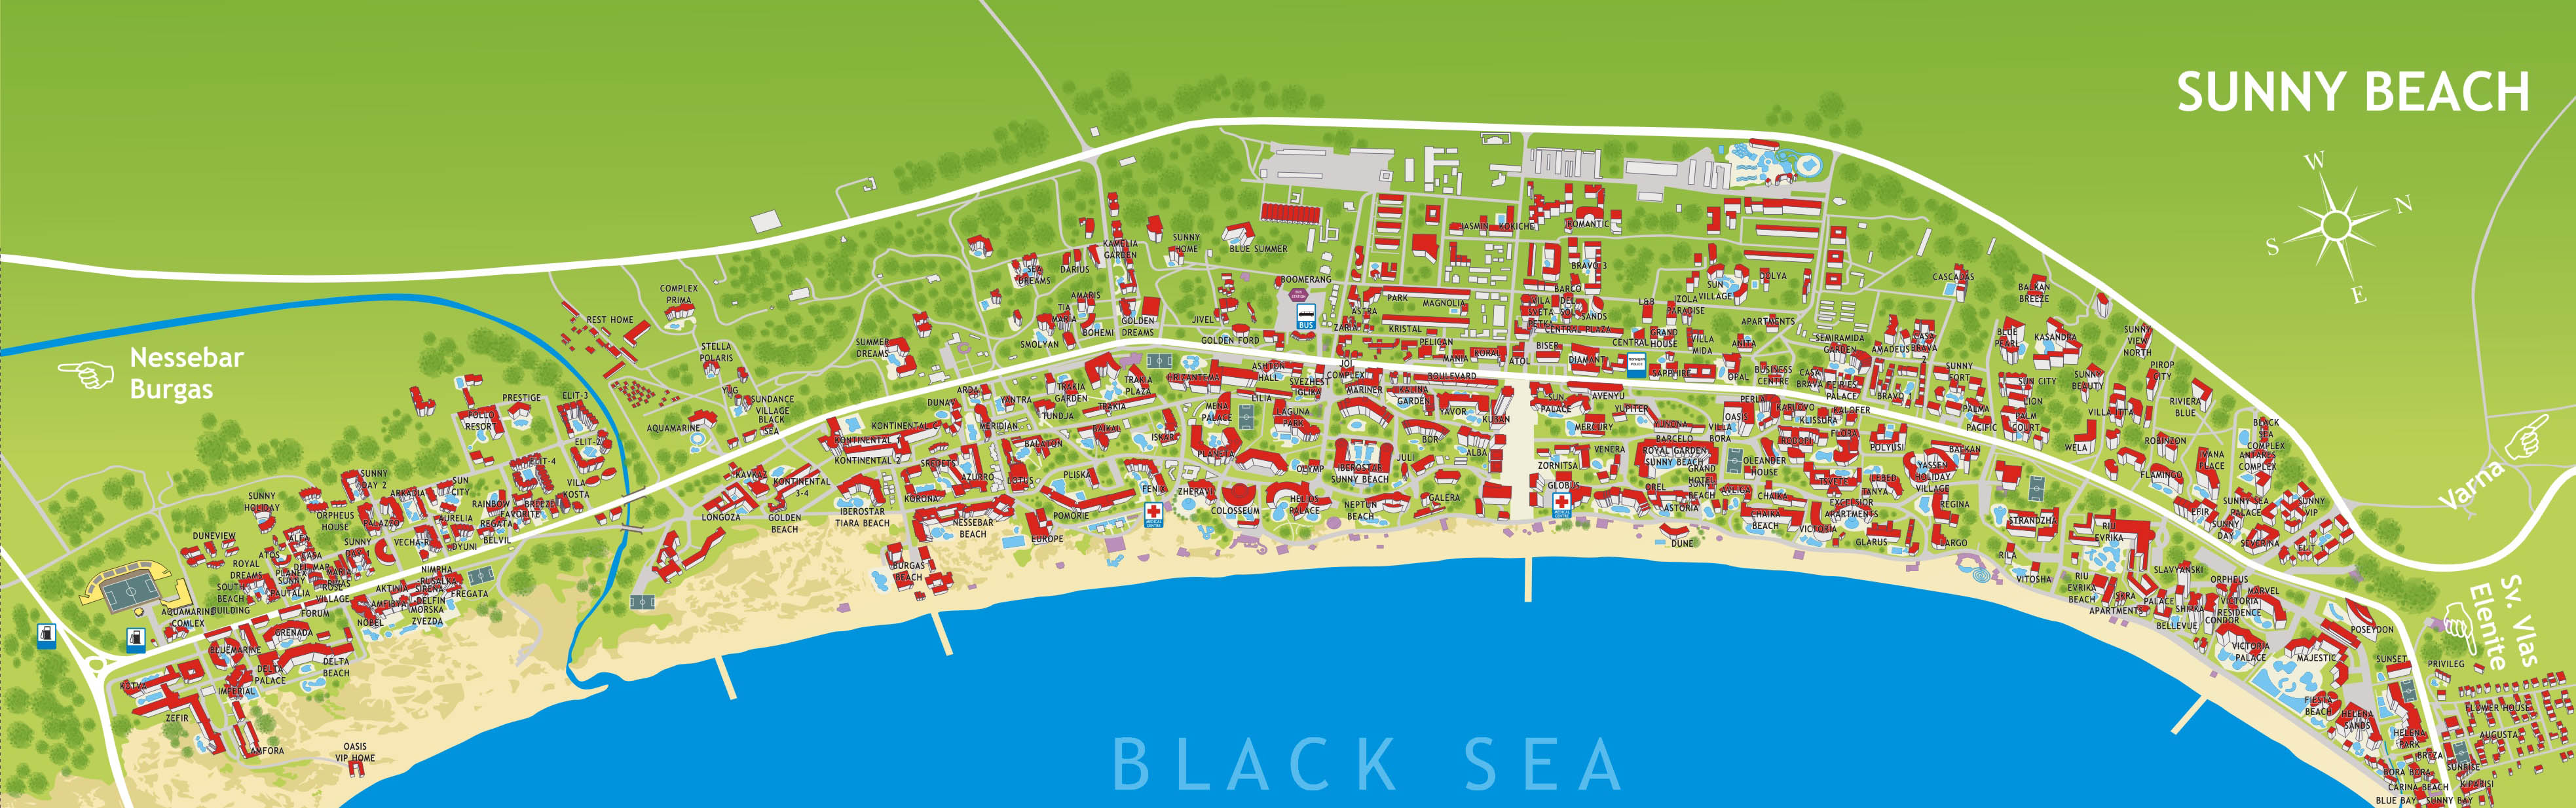 Sunny Beach Bulgaria Tripadvisor Forum